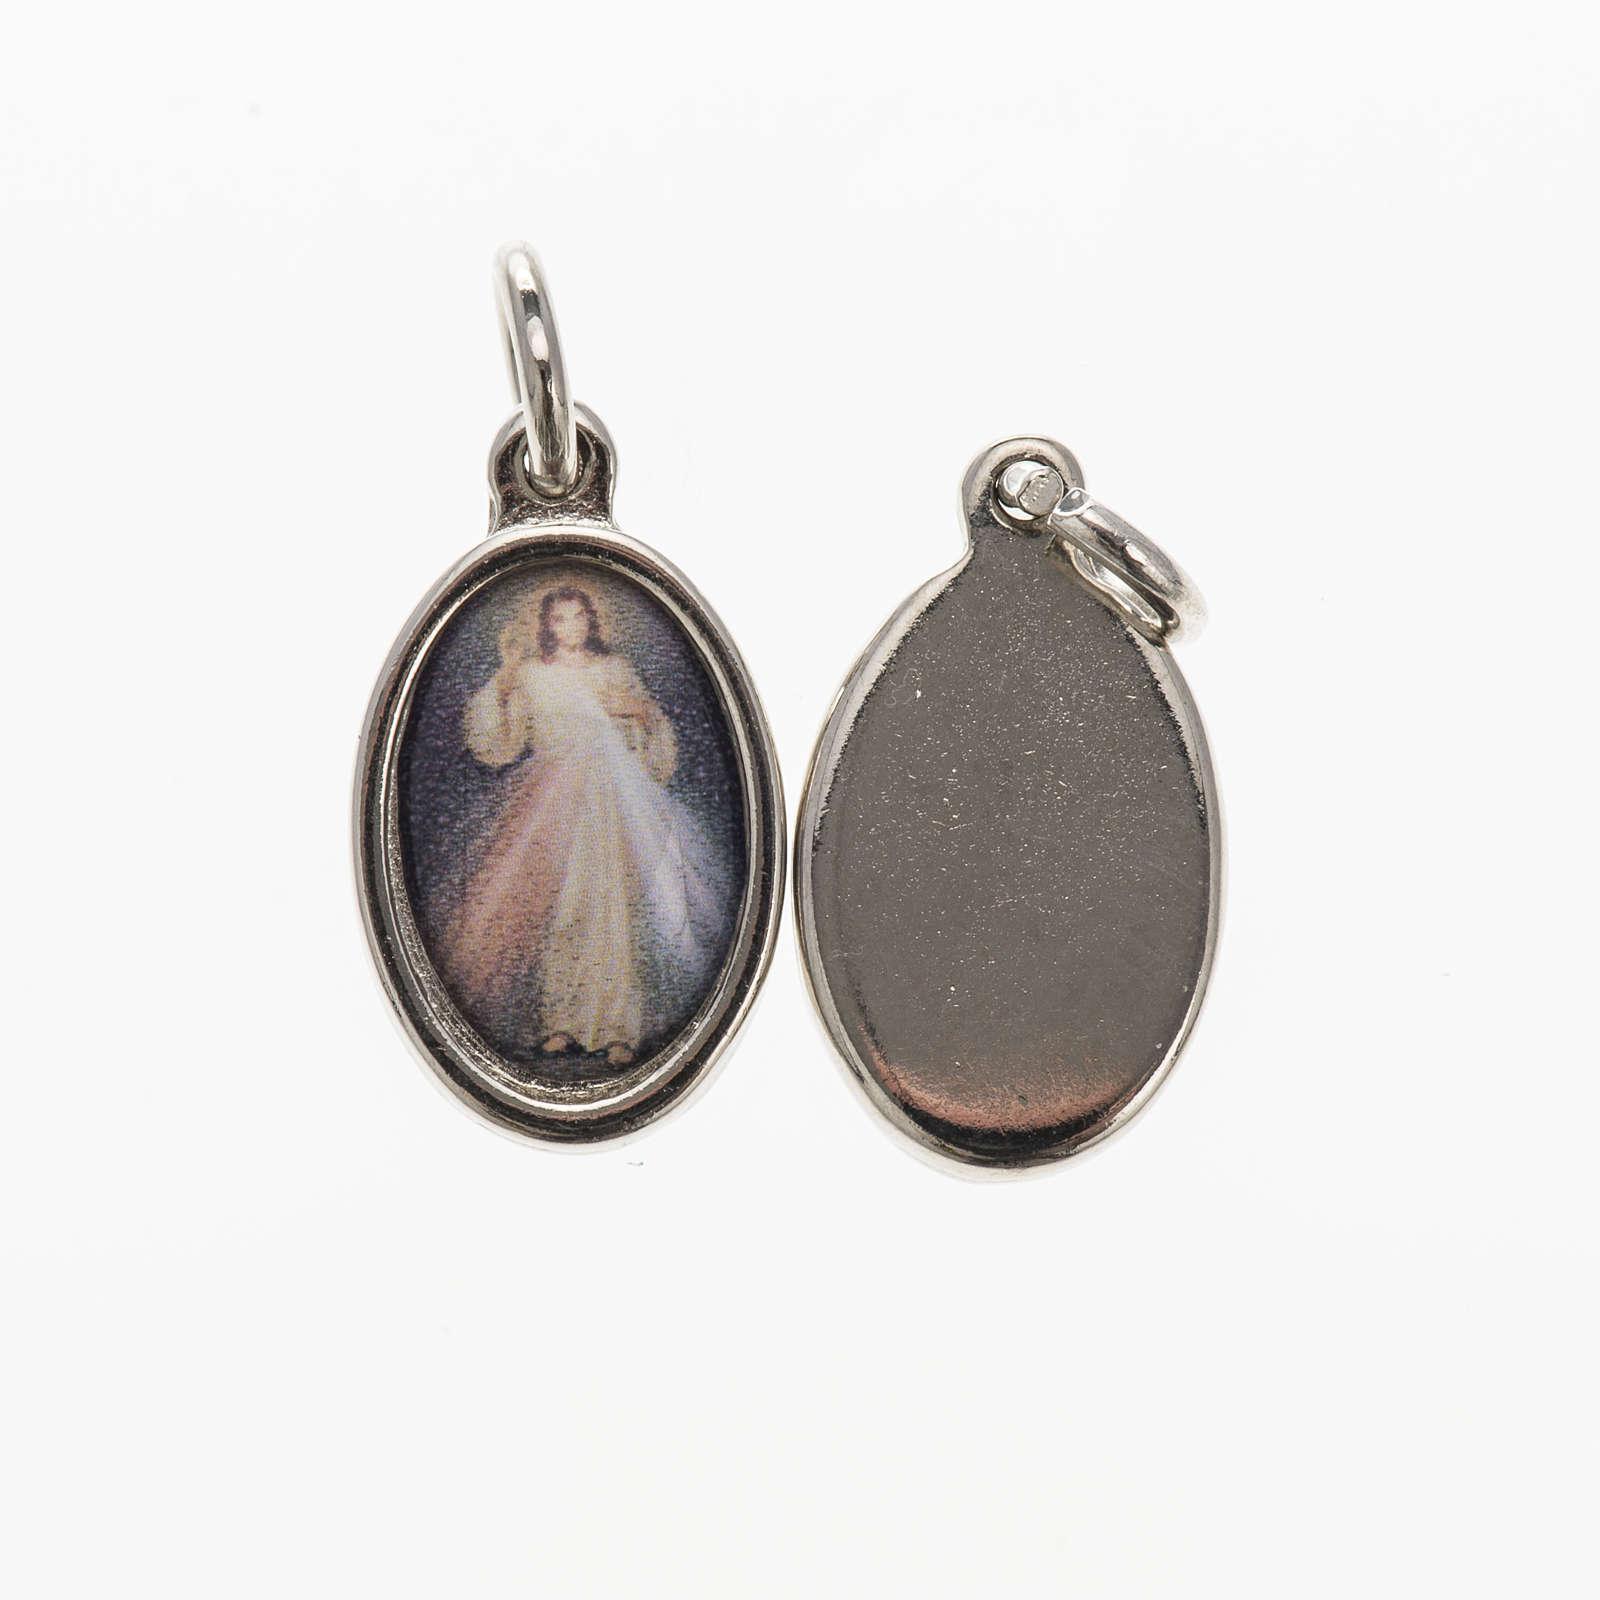 Medalha Cristo Misericordioso metal niquelado resina 1,5x1 cm 4